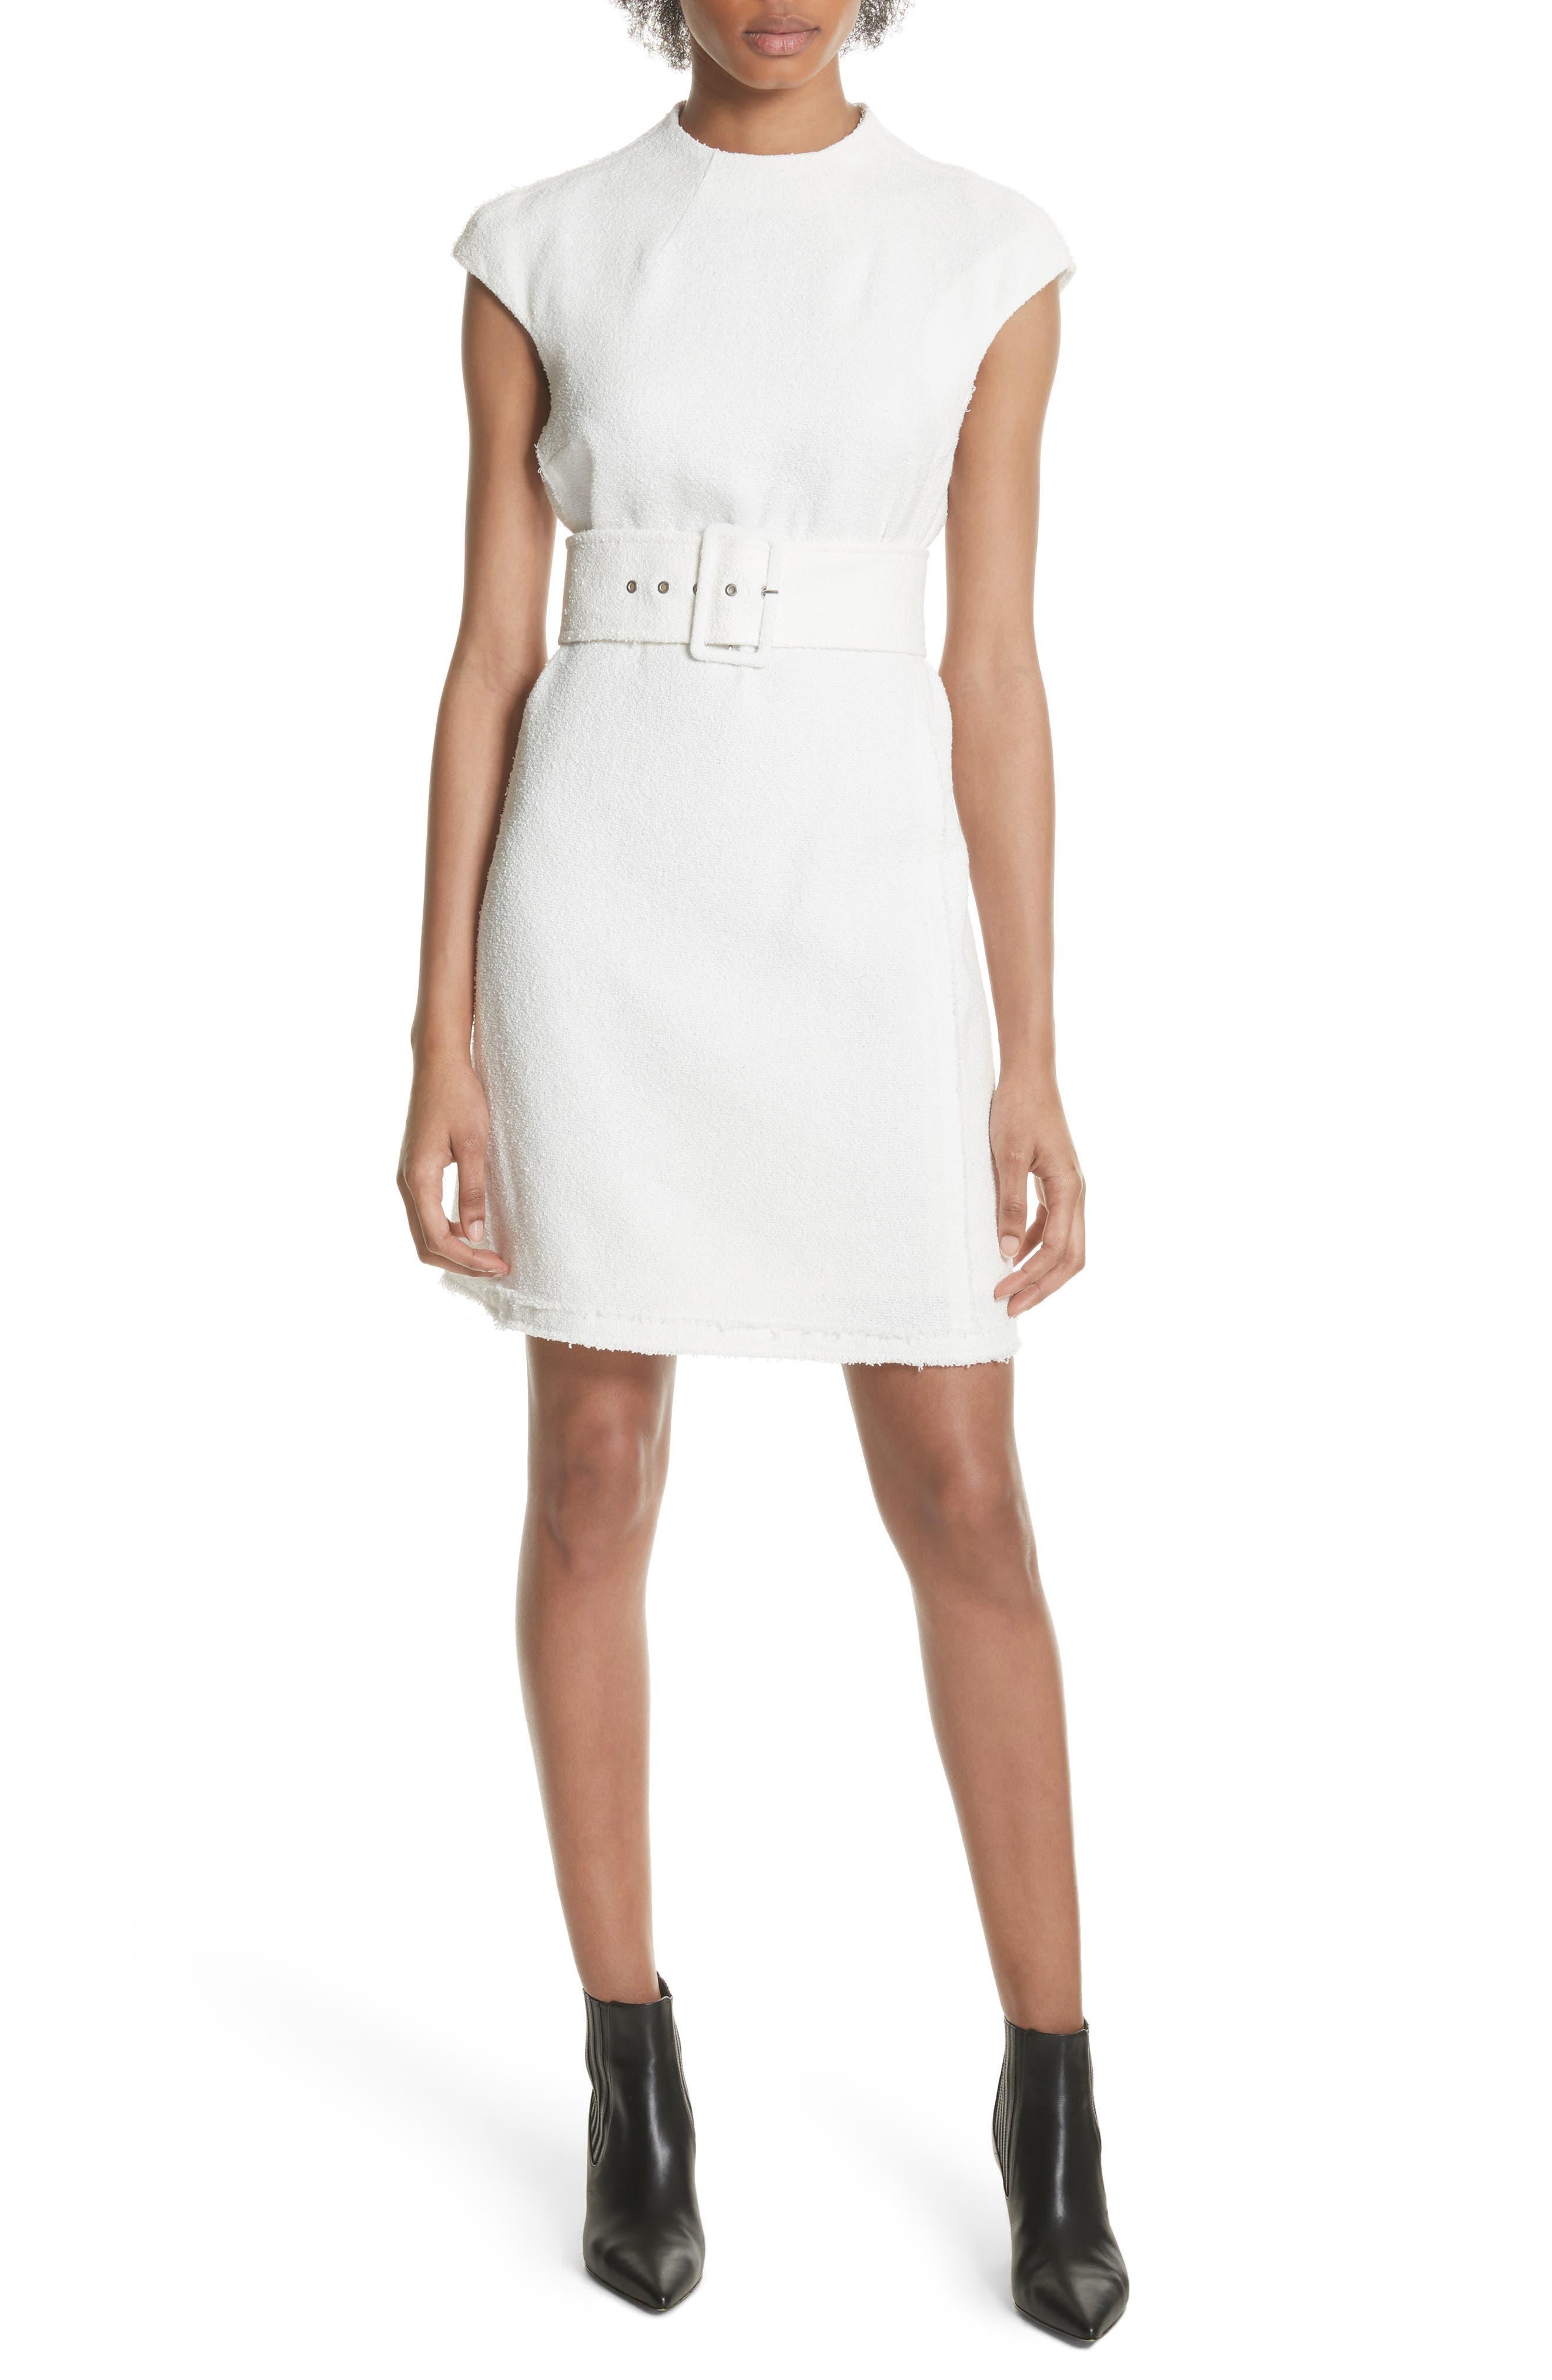 Theory Belted Mod Dress